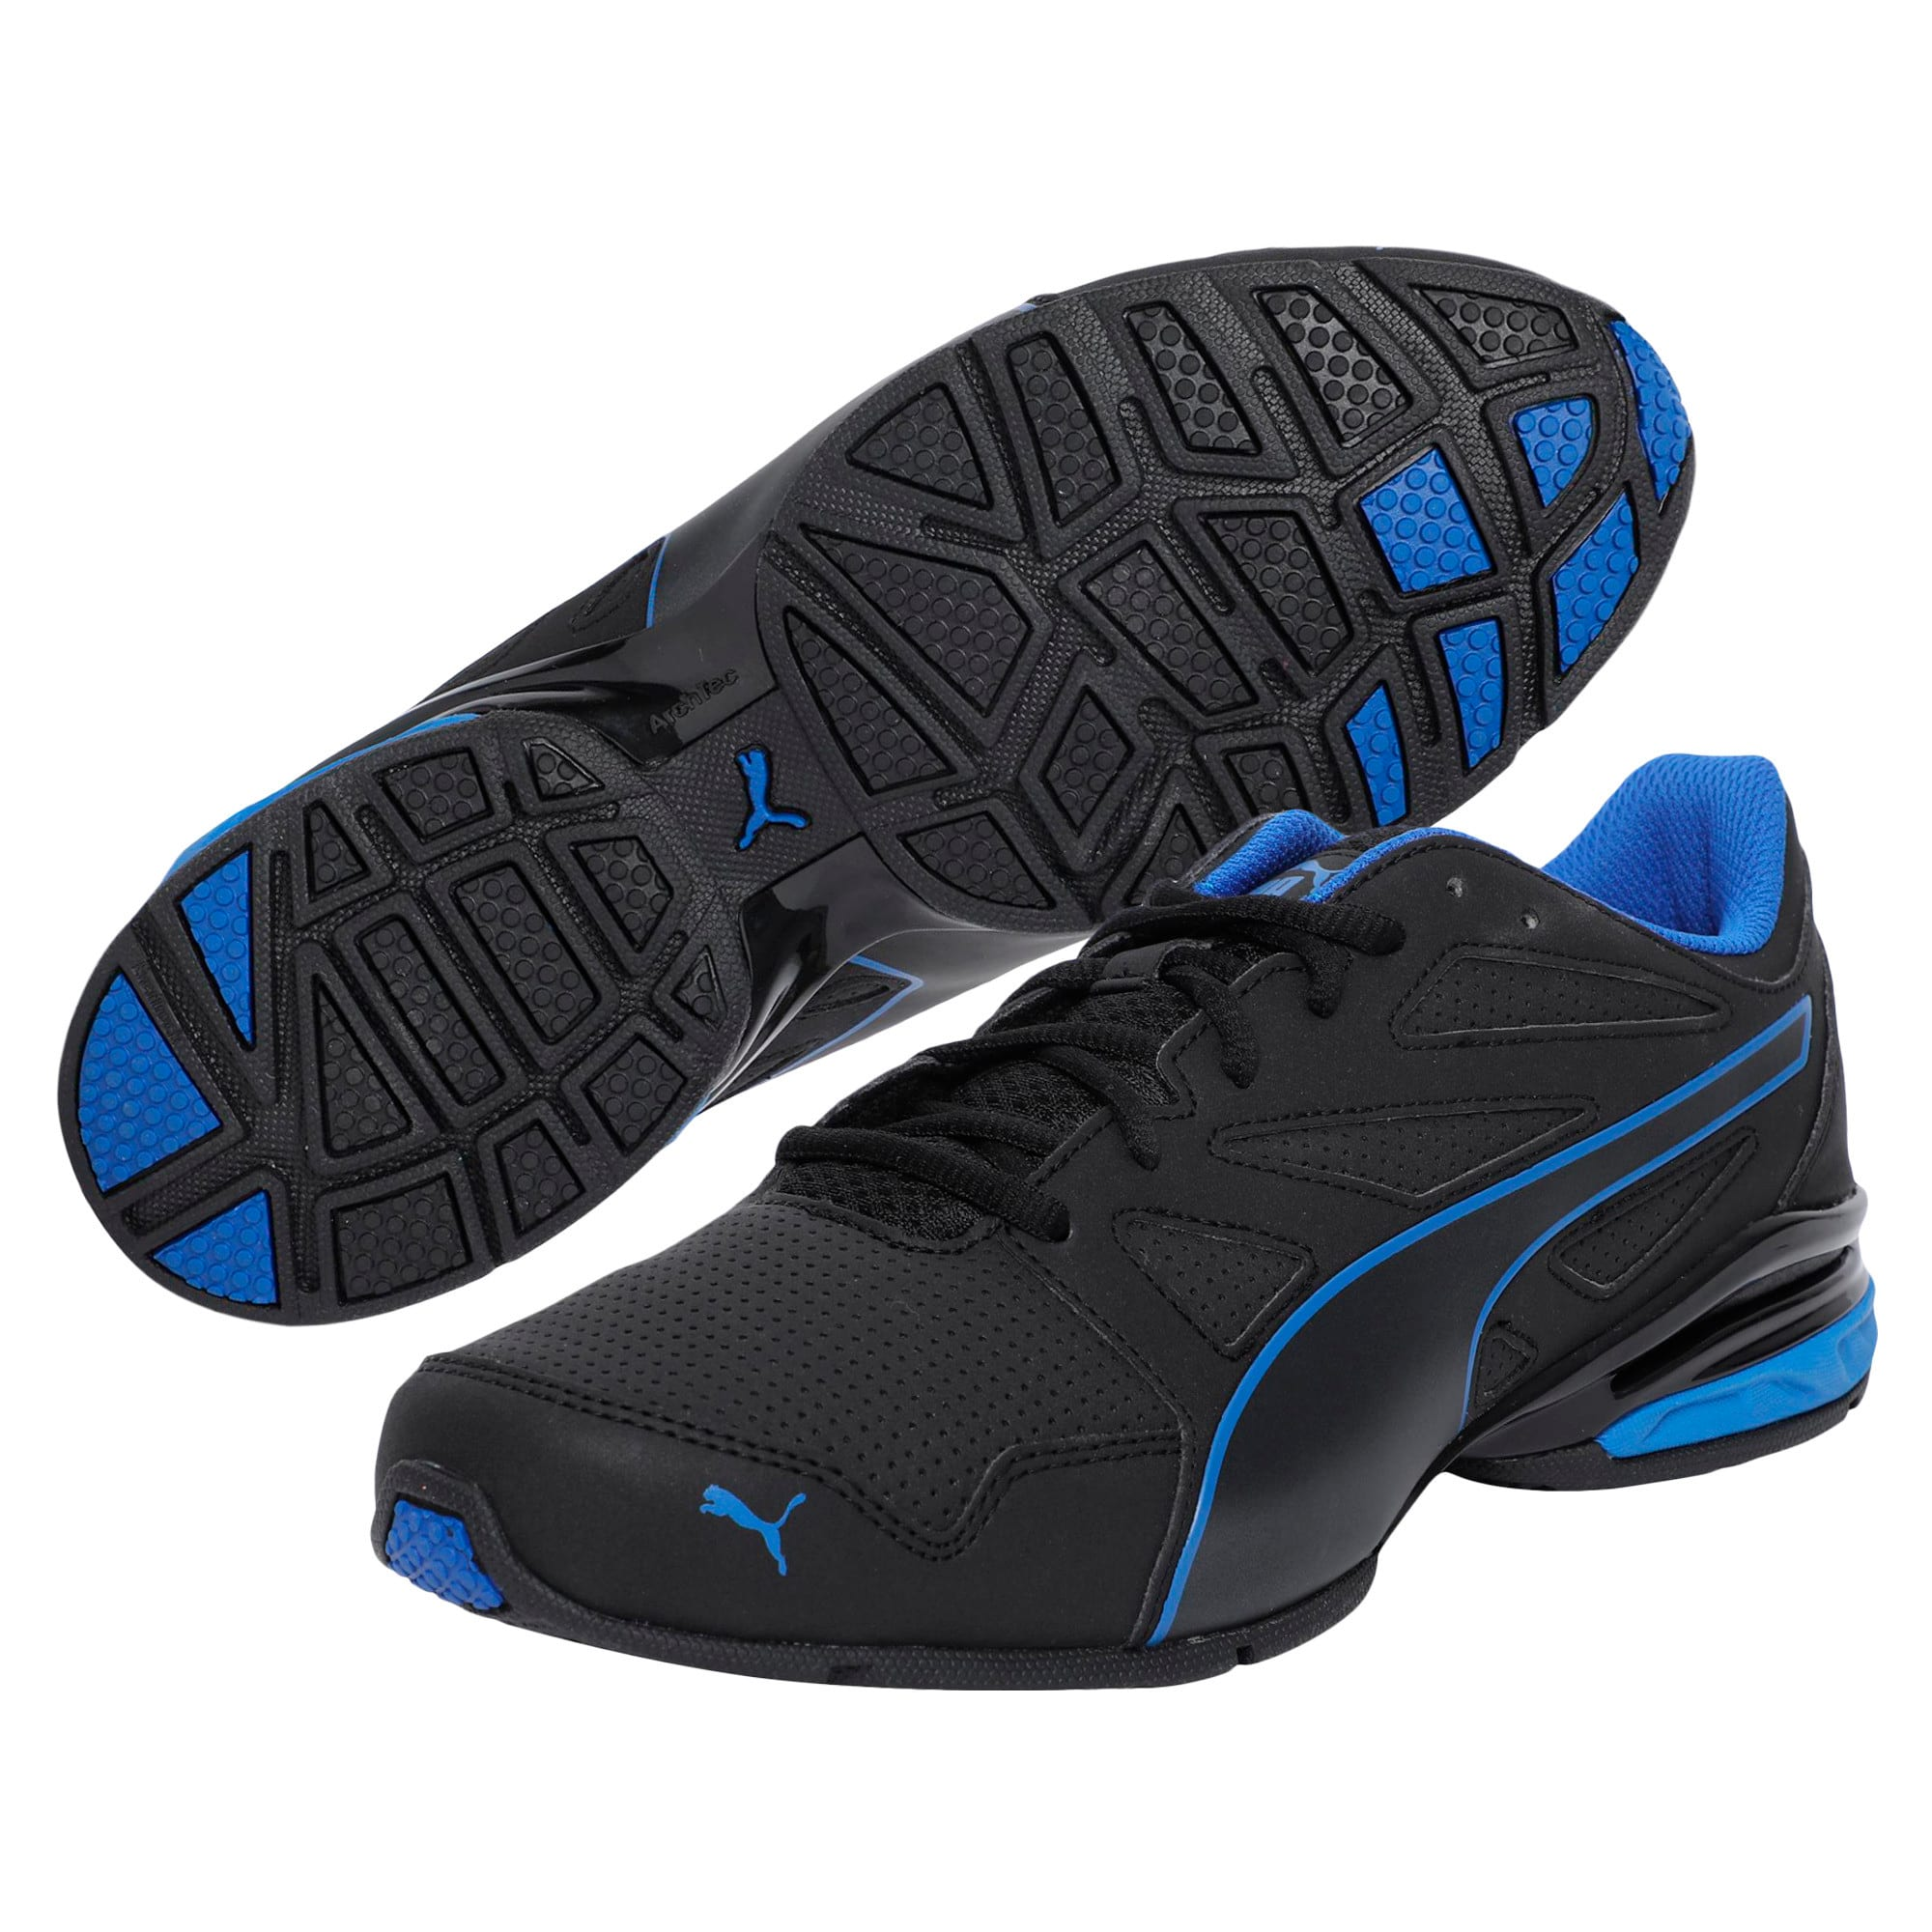 Thumbnail 2 of Tazon Modern SL Men's Running Shoes, Puma Black-Lapis Blue, medium-IND